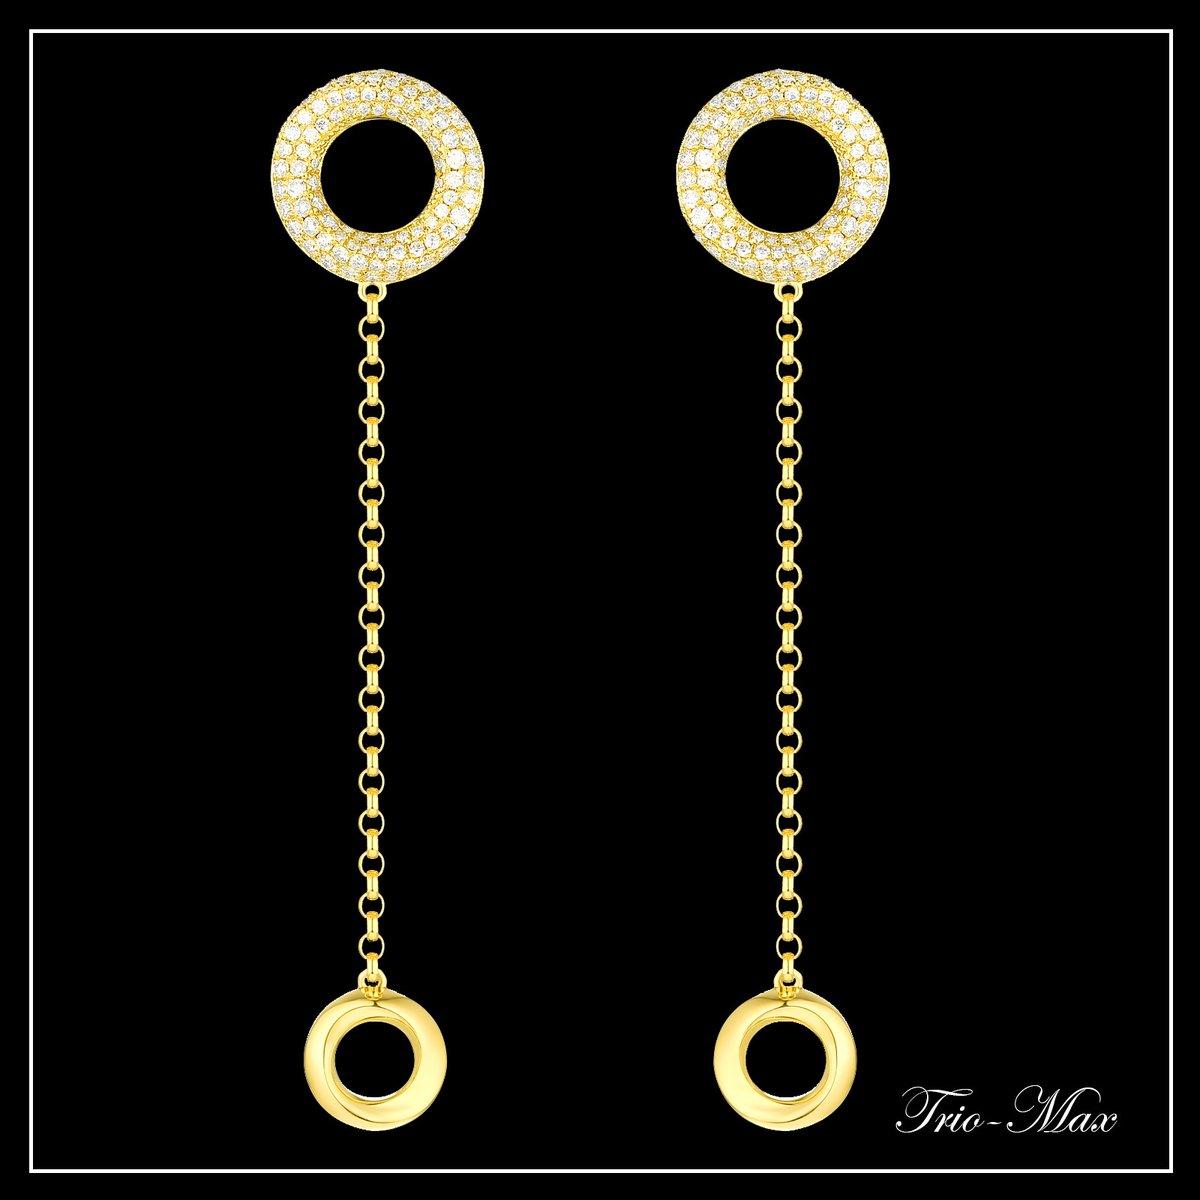 The Circle Trio-Max Earrings in 18K Yellow Gold for lovely date night! #newyork #happynewyear2020  #giftguide #giftsforher #vedantti  #nyc #christmas #winterfashion #jewelry #fashionaddict #fashionista #whitegold #diamonds #fallfashion #falltrends #love #lookbook #jewelrygram